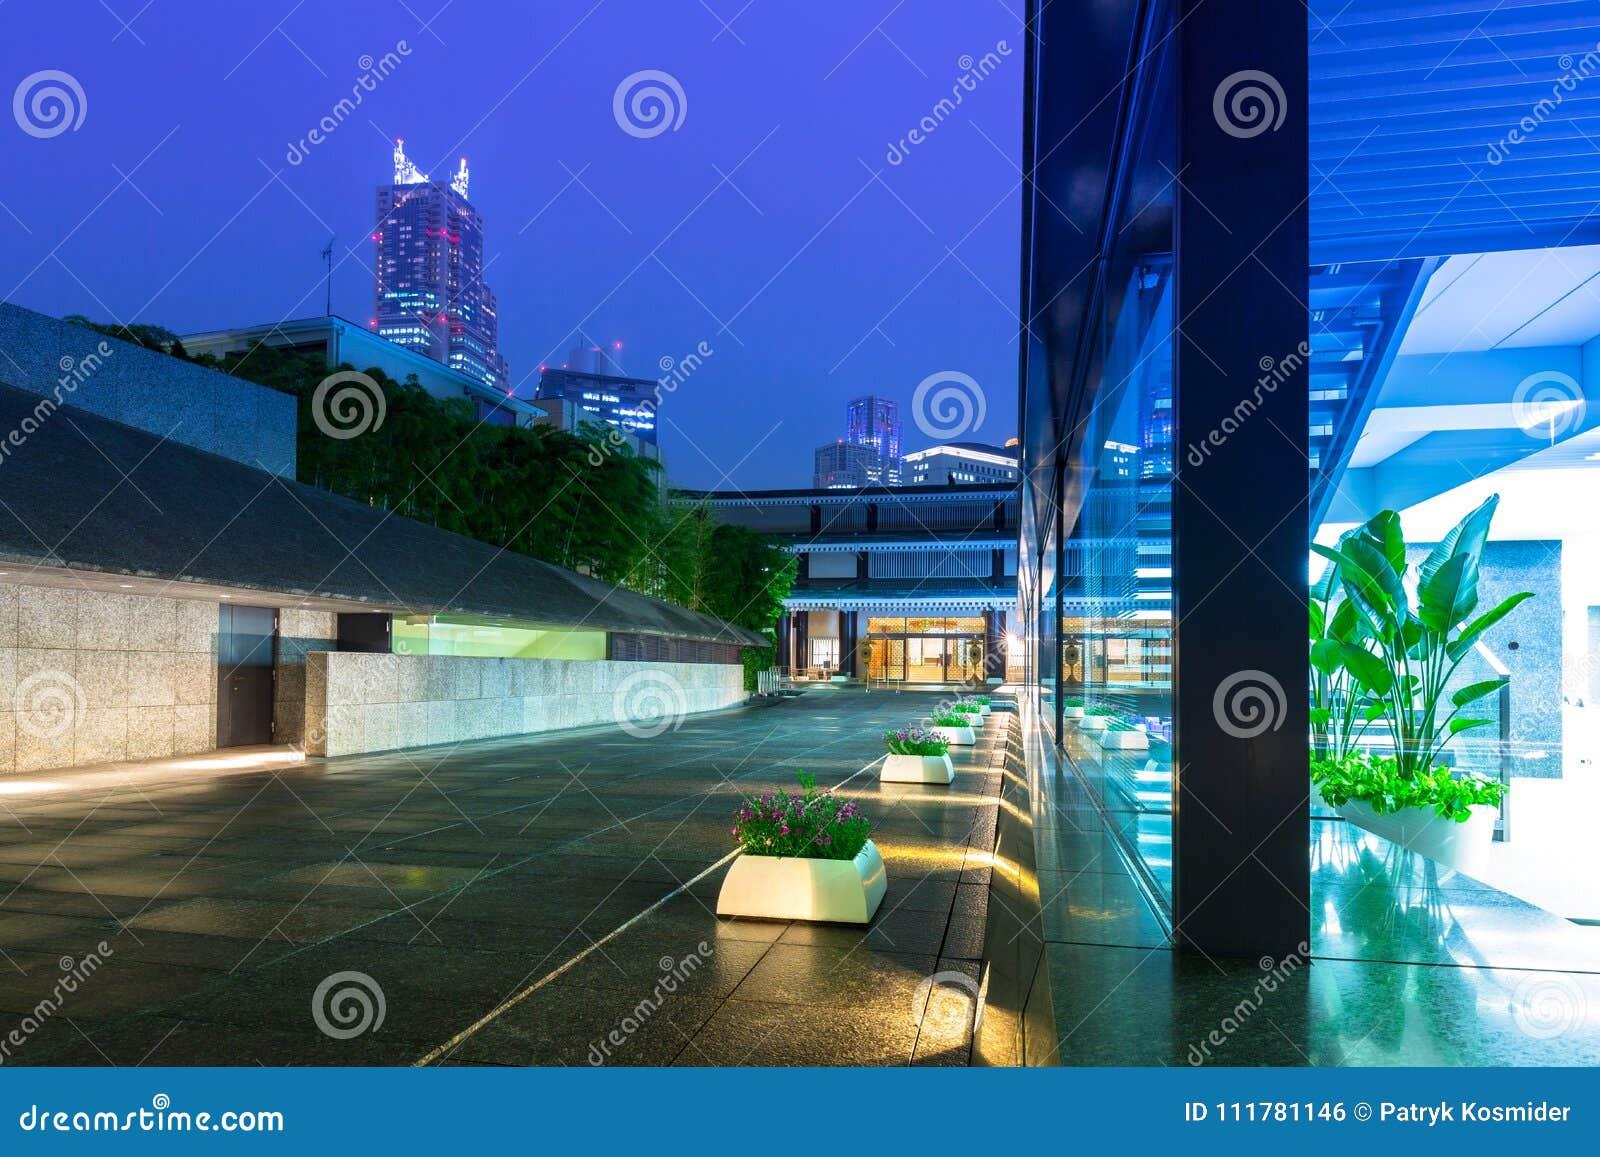 Cityscape of Shinjuku district of Tokyo